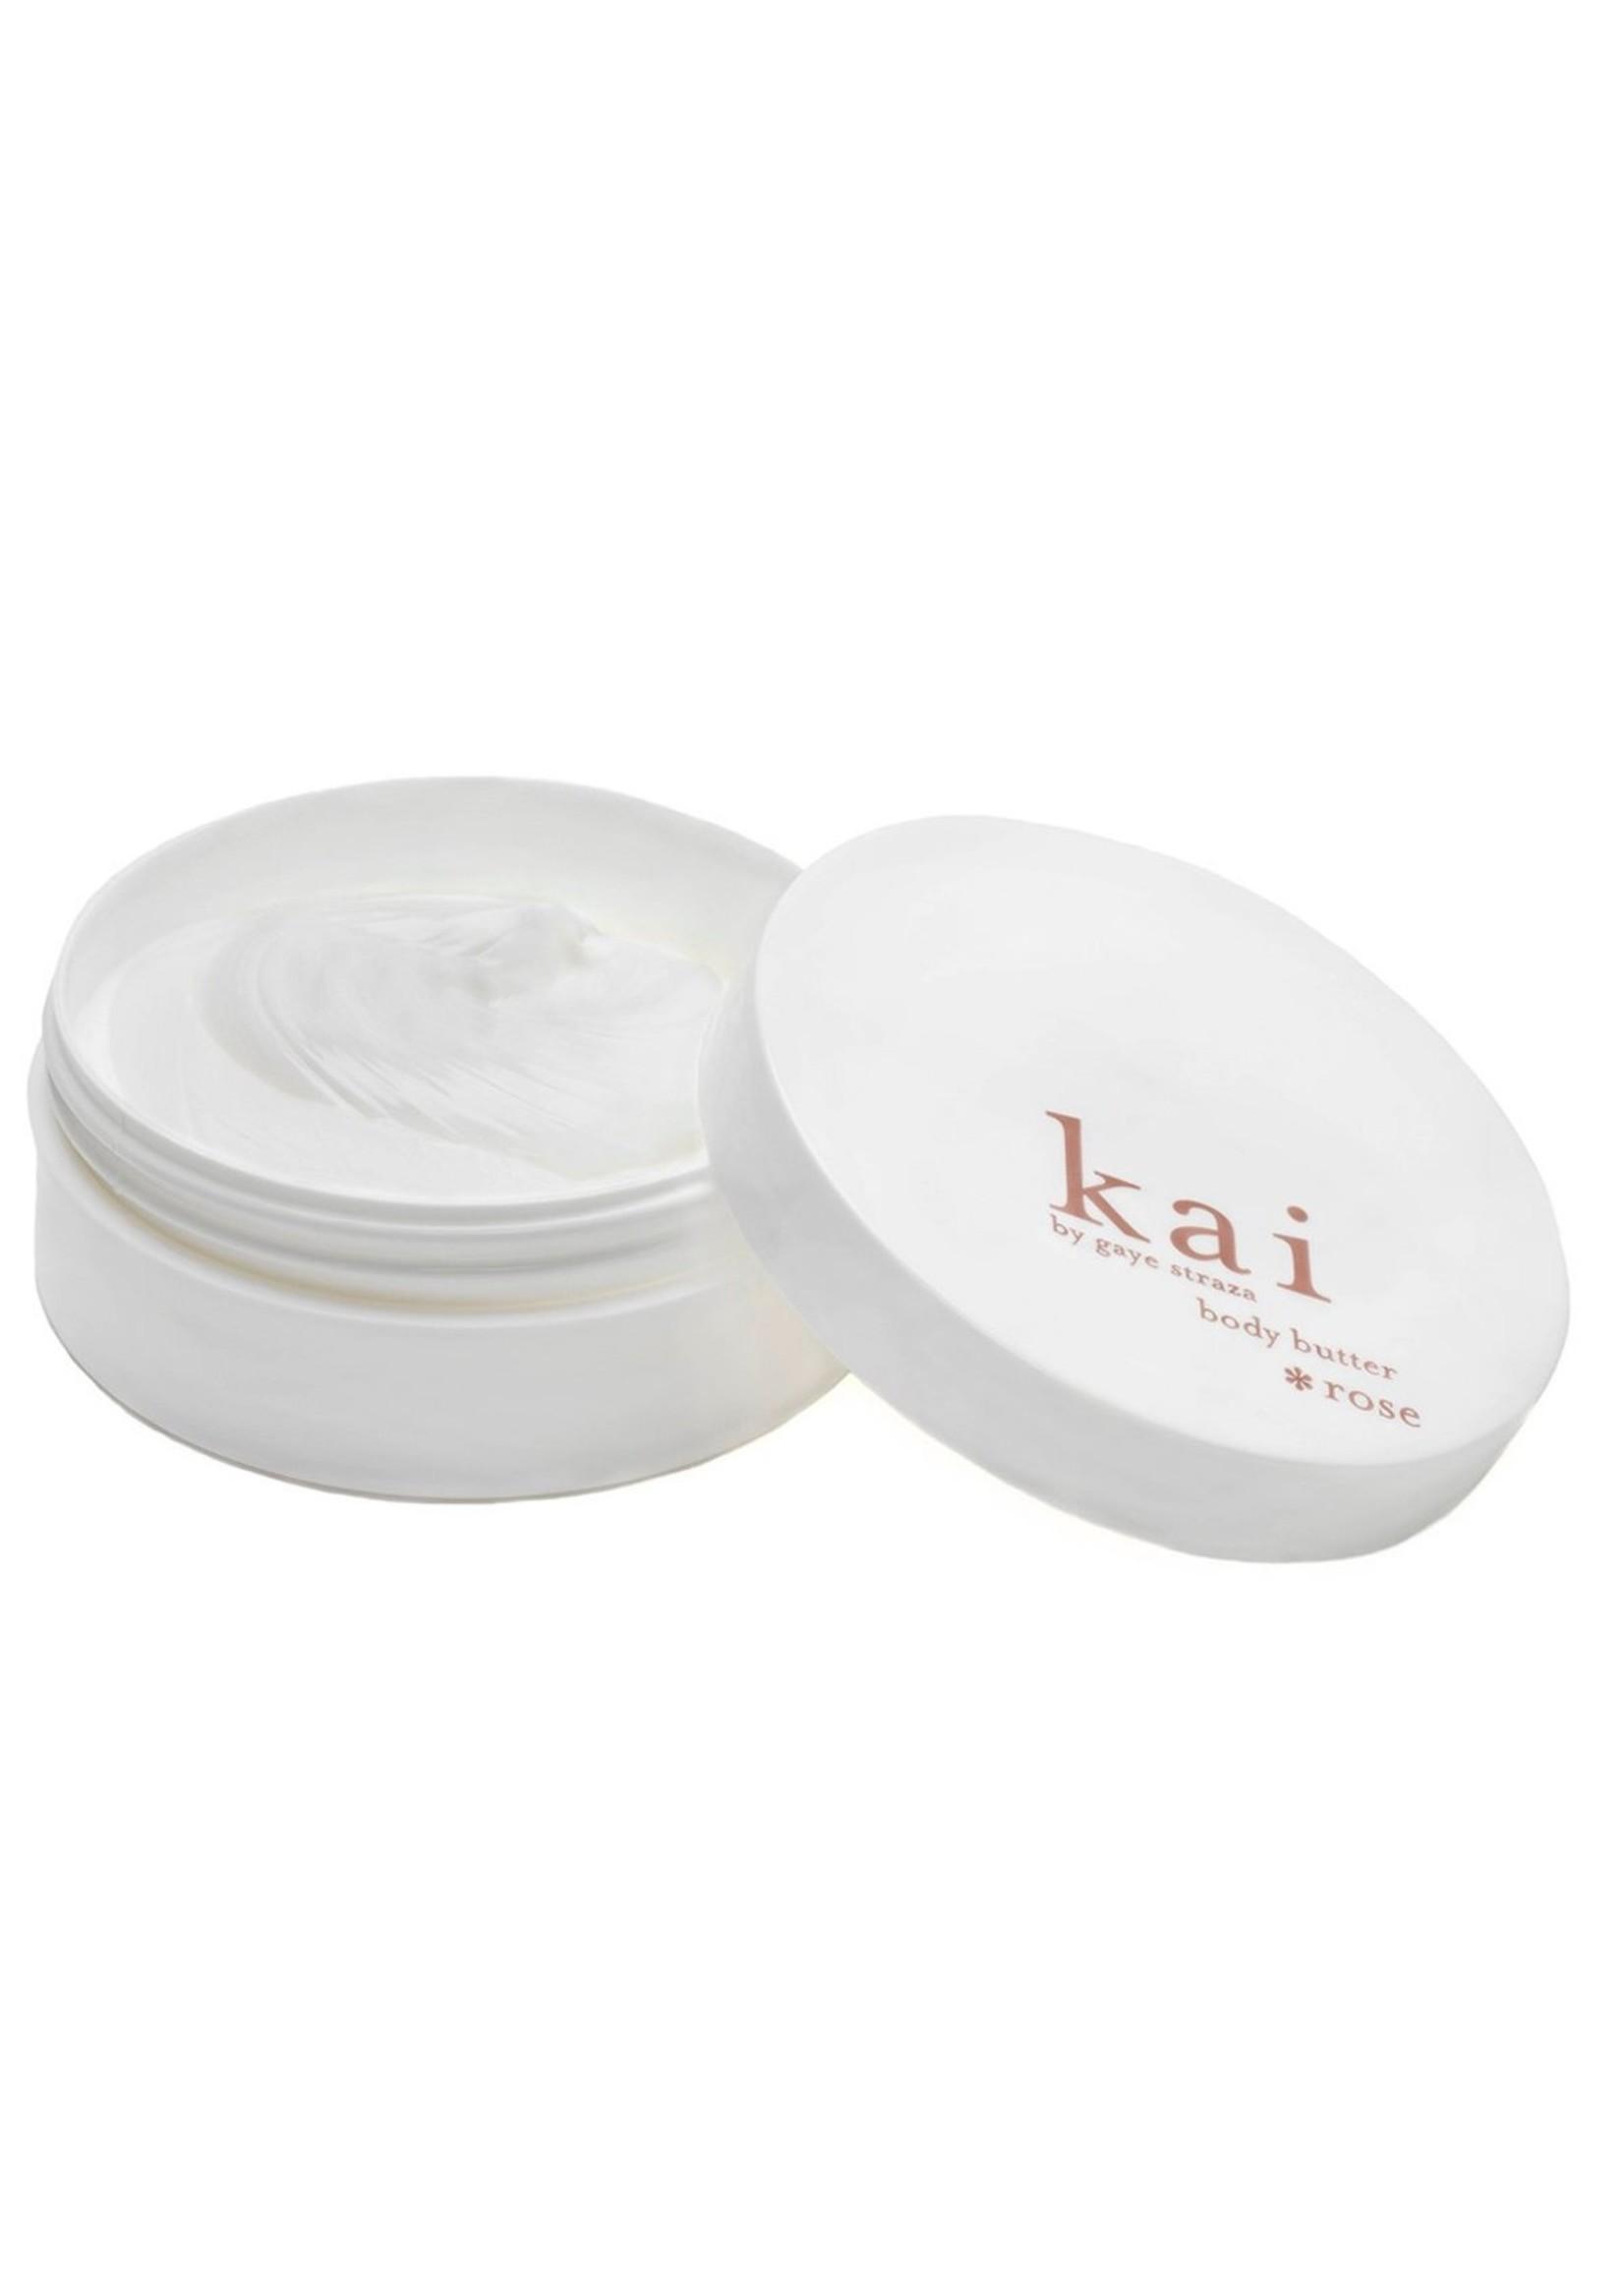 Kai Fragrance Kai Silky Body Butter